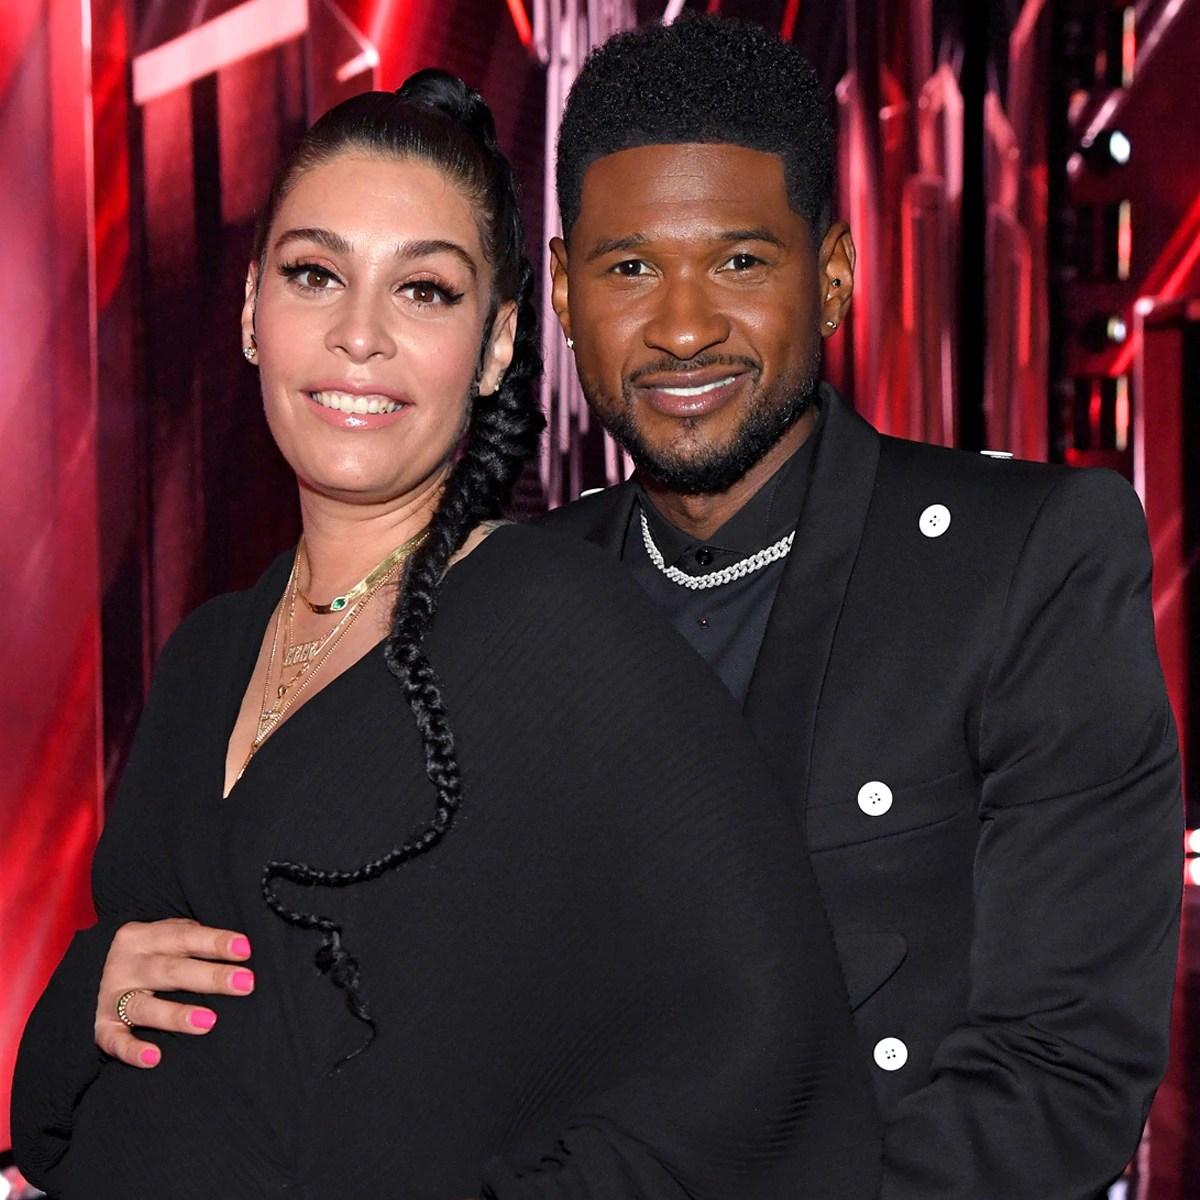 Usher Welcomes Second Child With Girlfriend Jenn Goicoechea